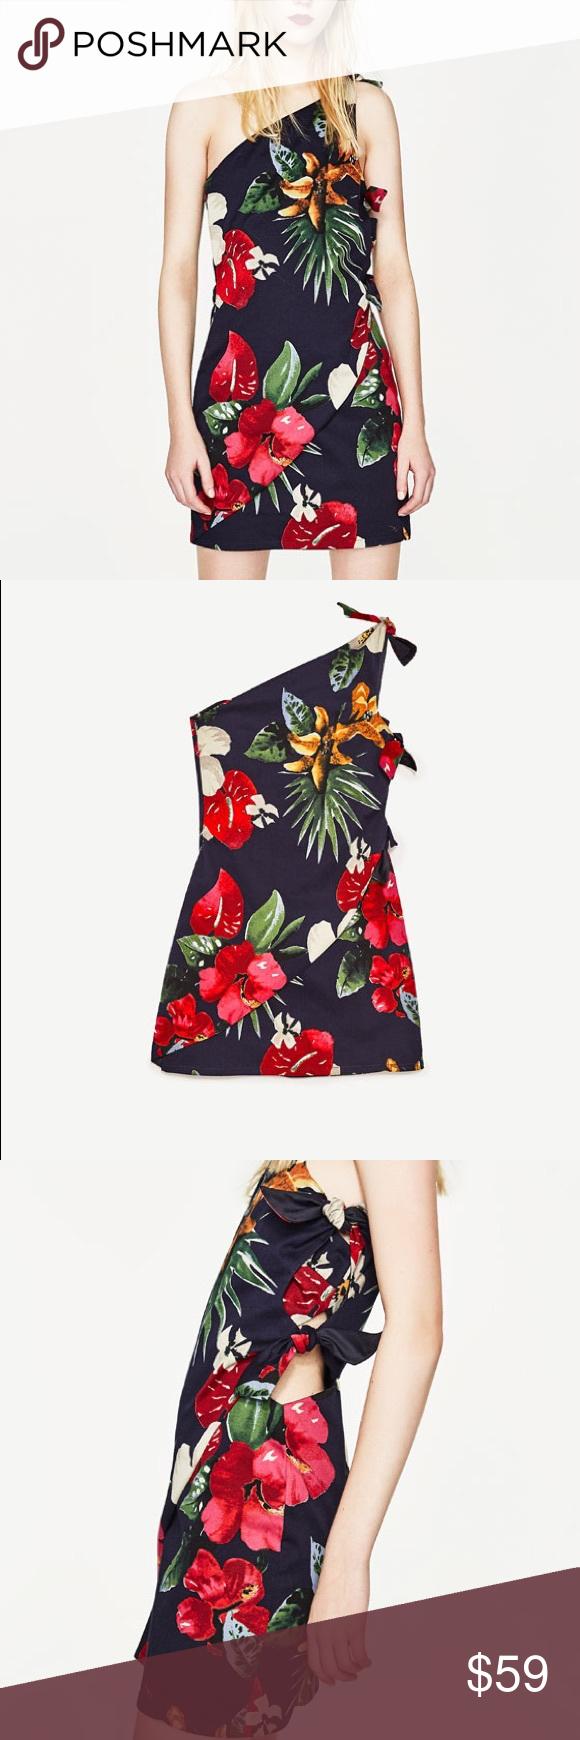 8ccadf5221b7 Zara Hawaiian floral print dress w/ asymmetric hem Love floral print with  dark background.... you'll be set for luau Zara Dresses